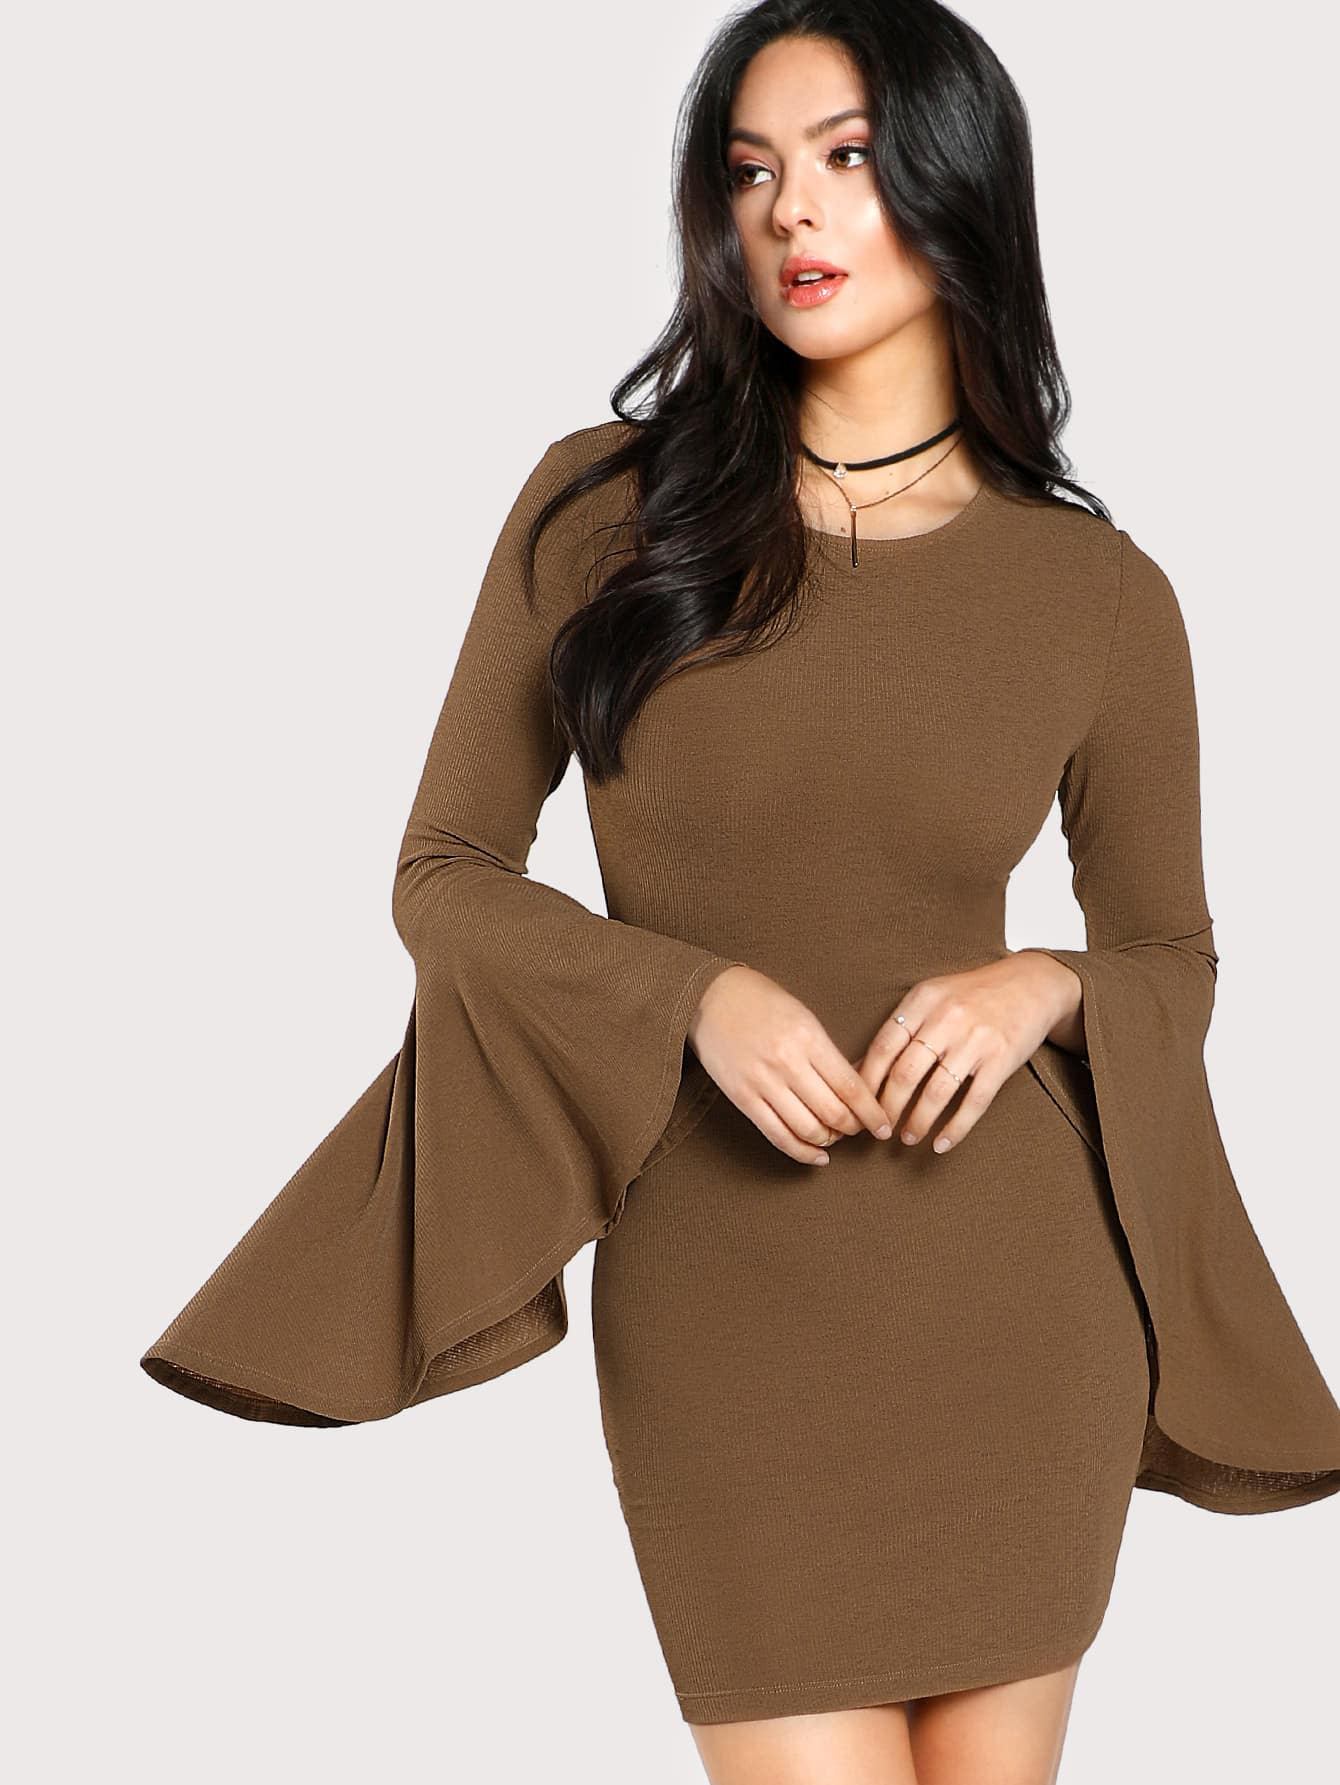 Exaggerate Fluted Sleeve Rib Knit Dress dressmmc171026701